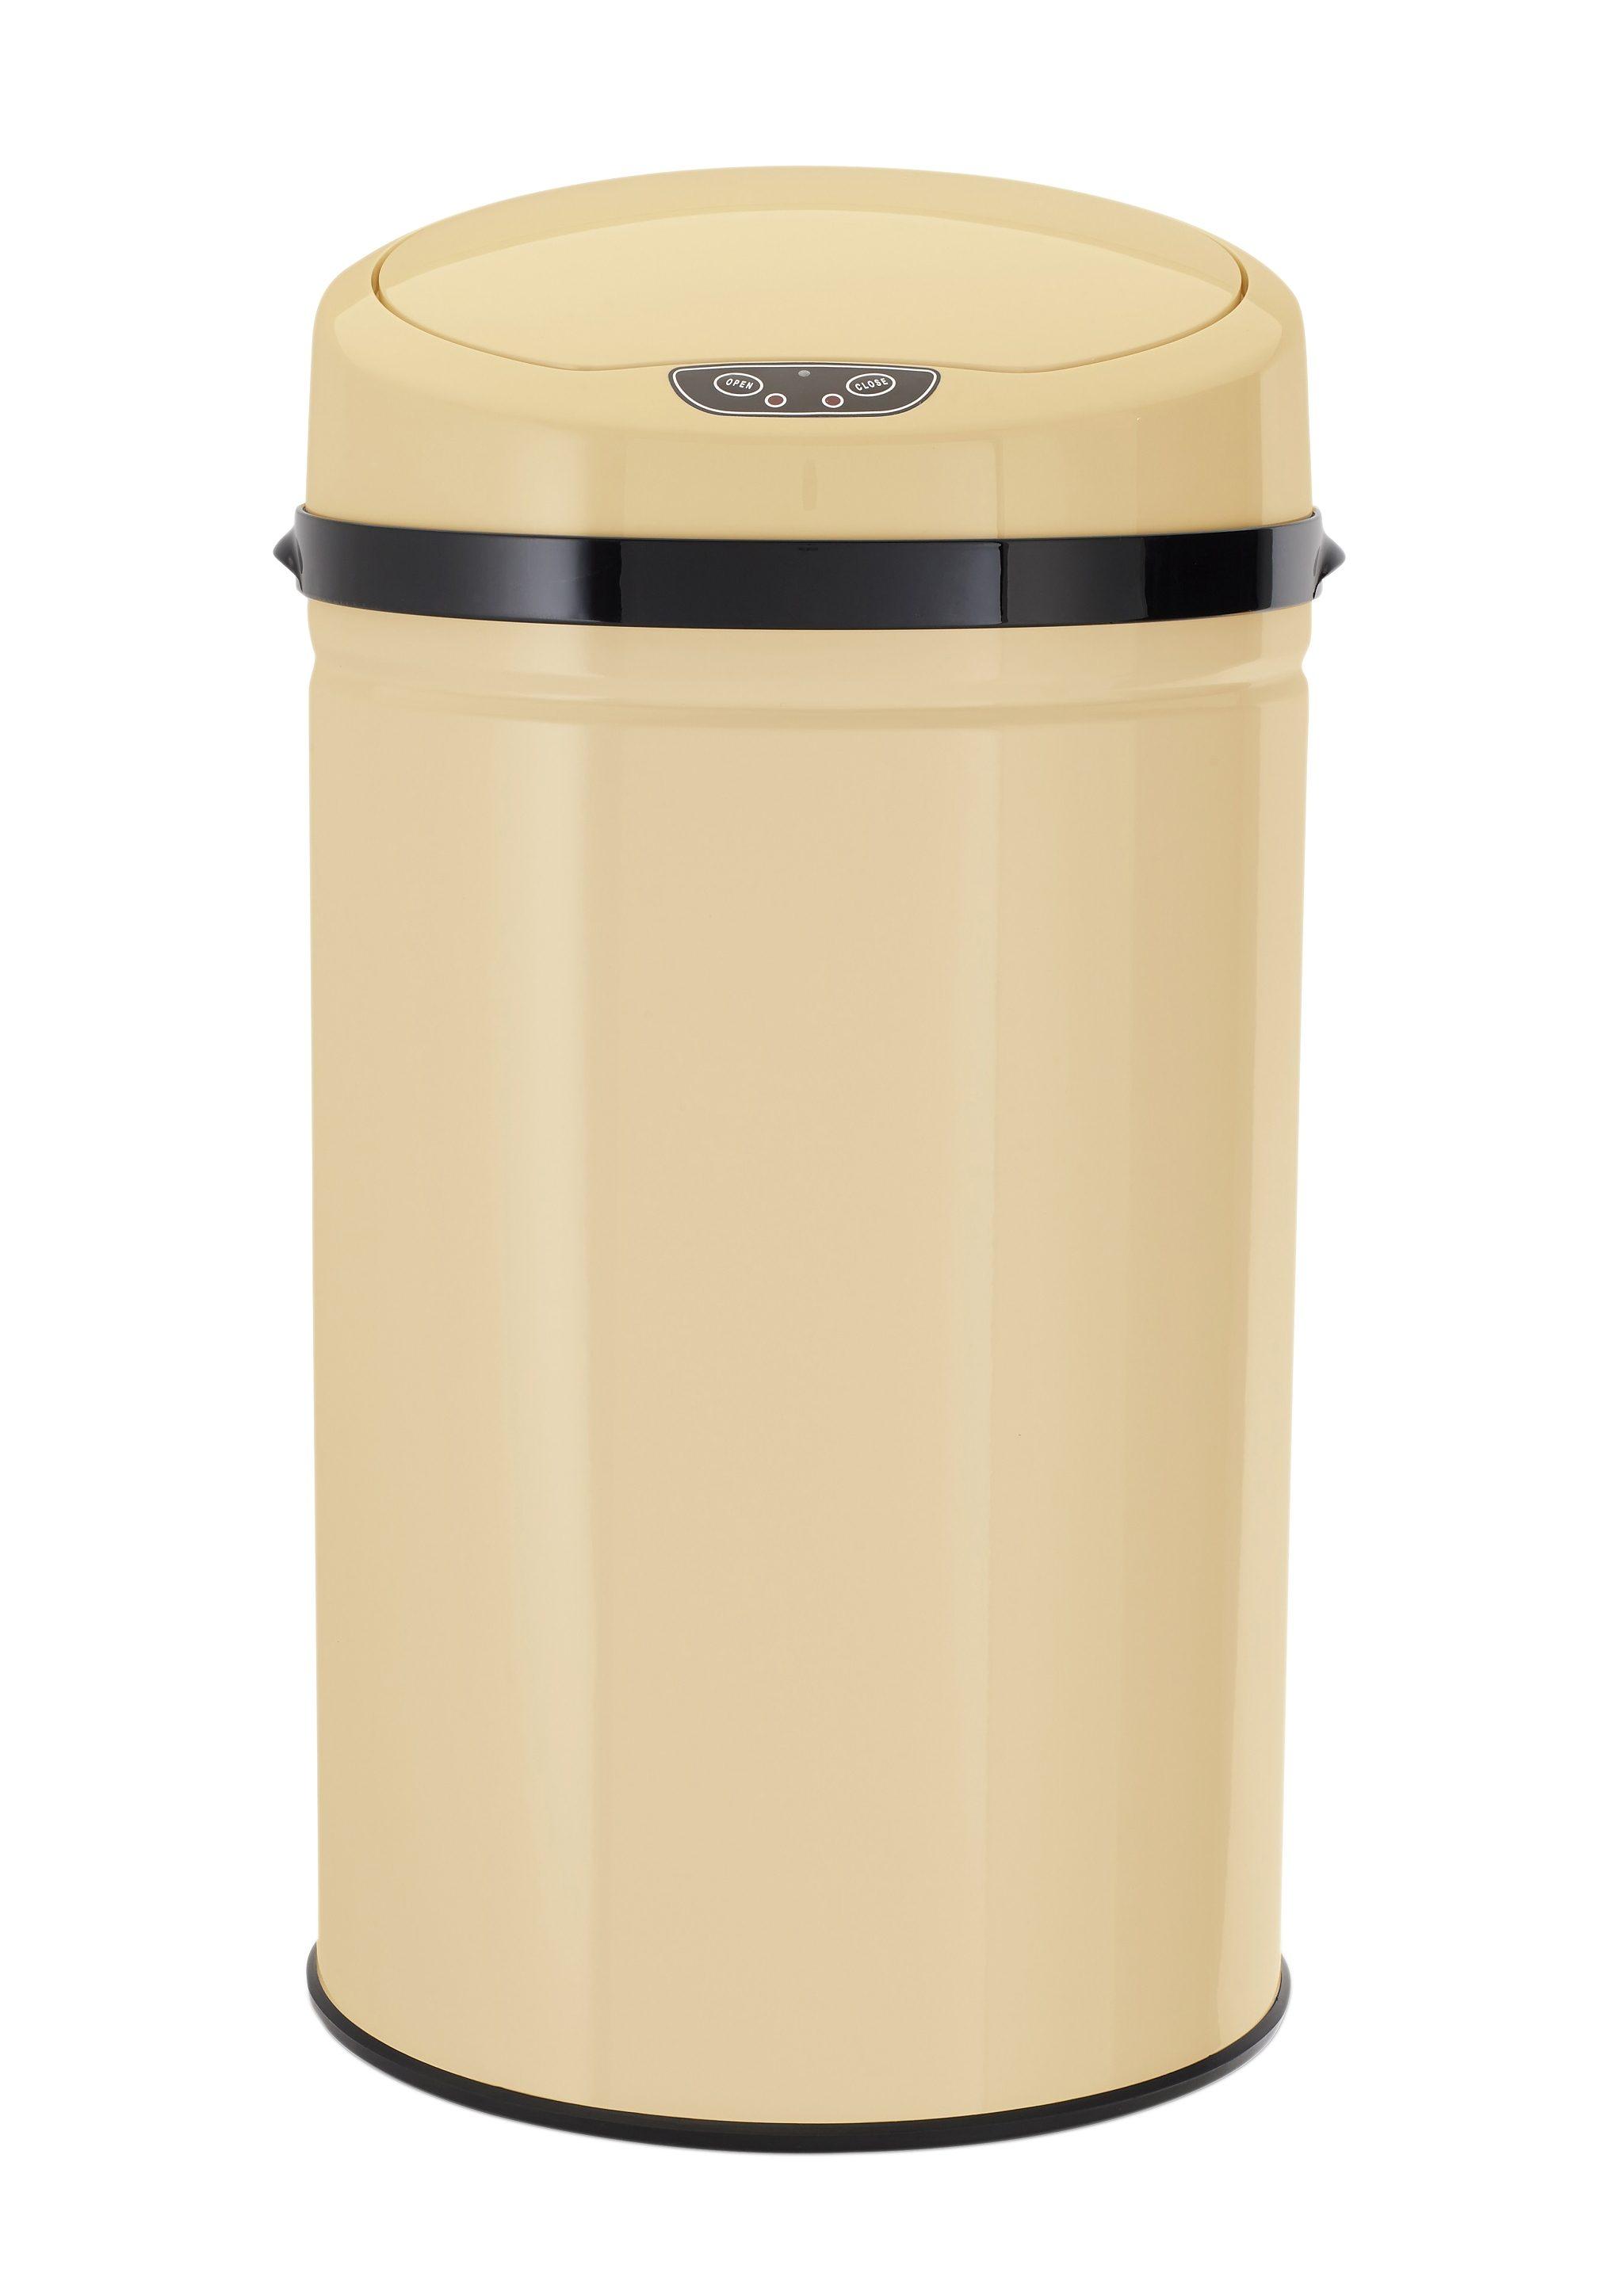 Edelstahl-Abfalleimer mit Infrarotsensor, 30 Liter, »INOX VANILLA«, Echtwerk